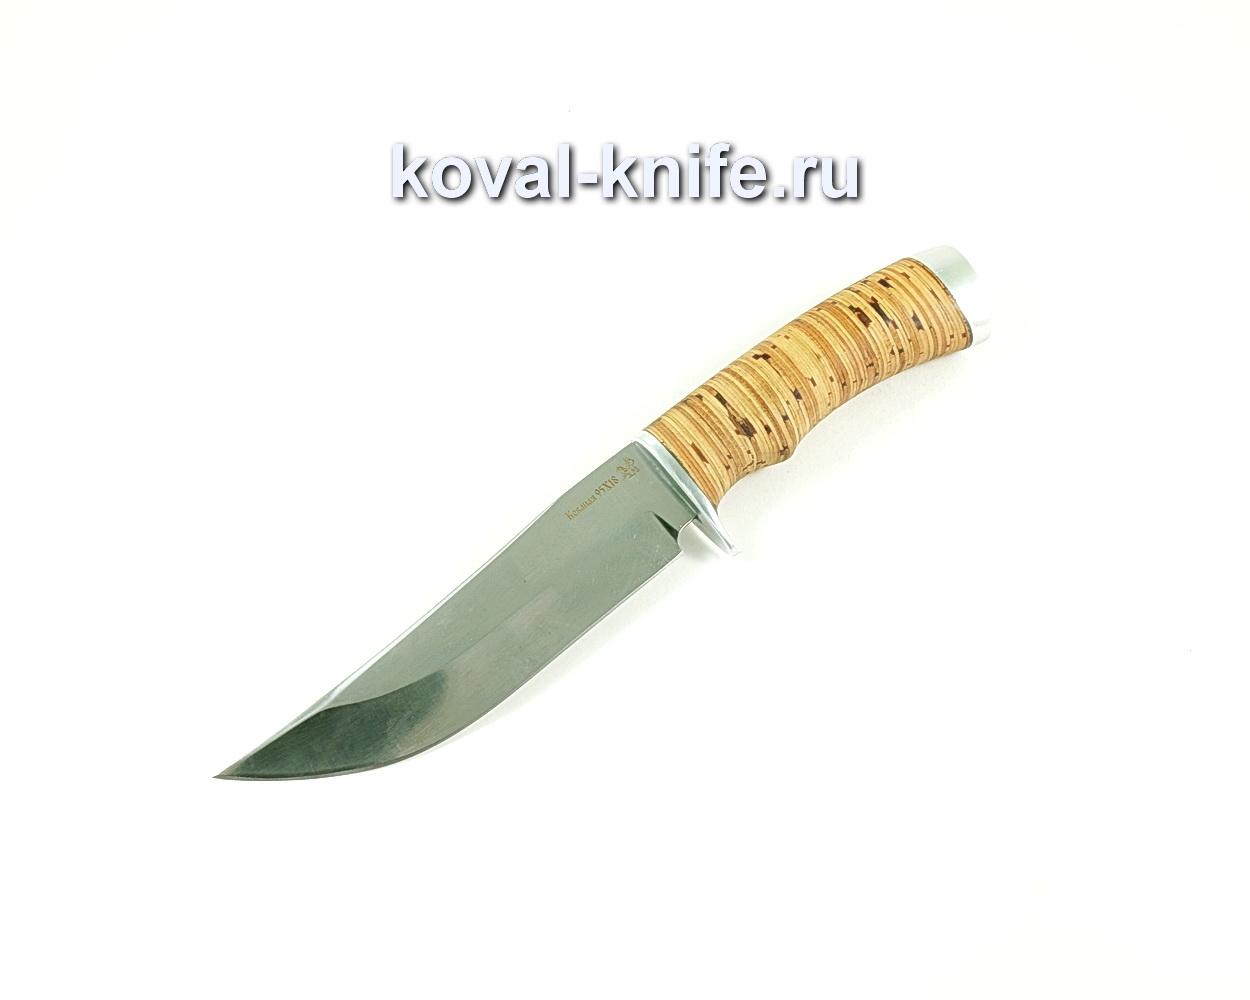 Нож Клыч (сталь 95х18), рукоять береста A283